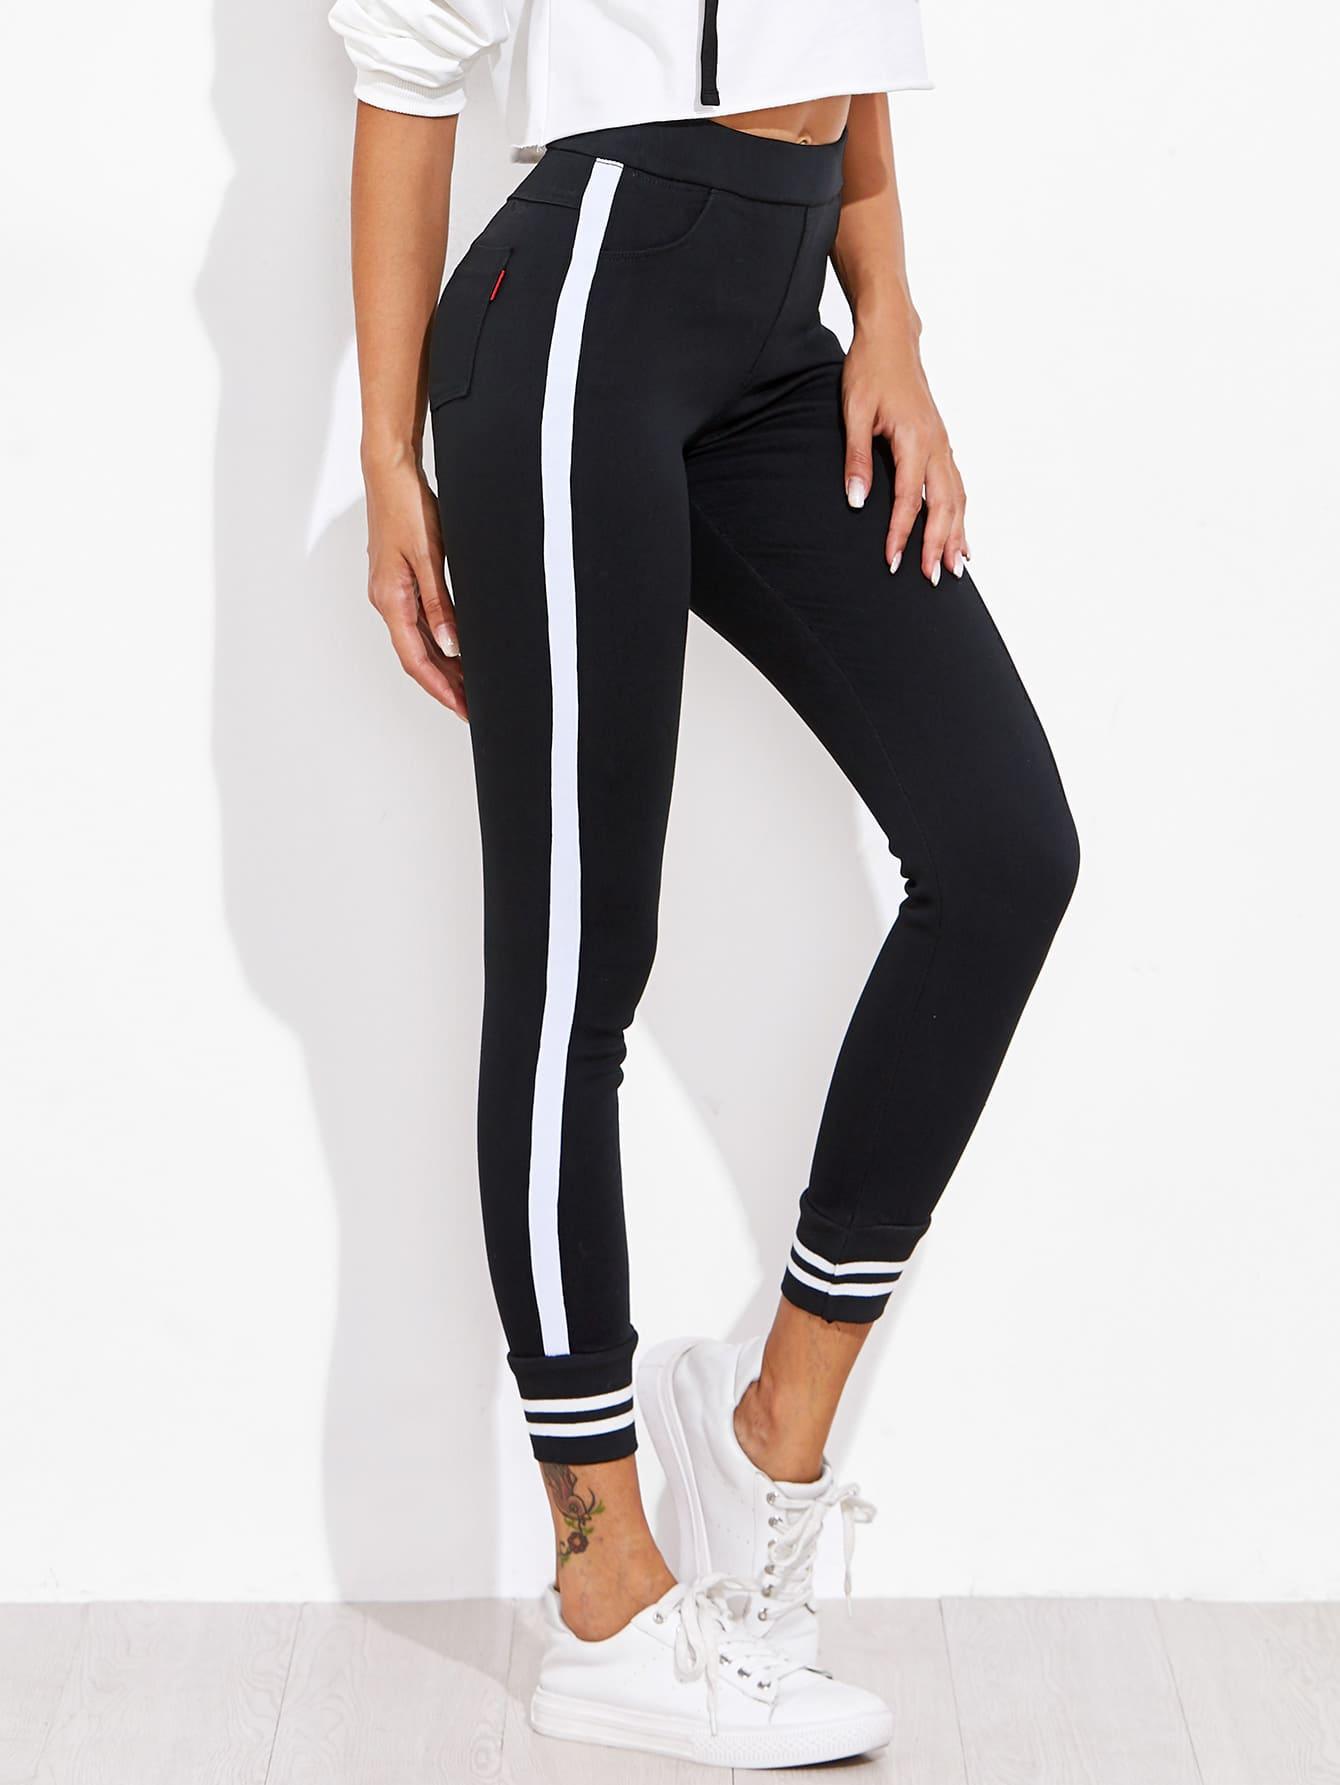 Contrast Striped Sport Leggings Pants